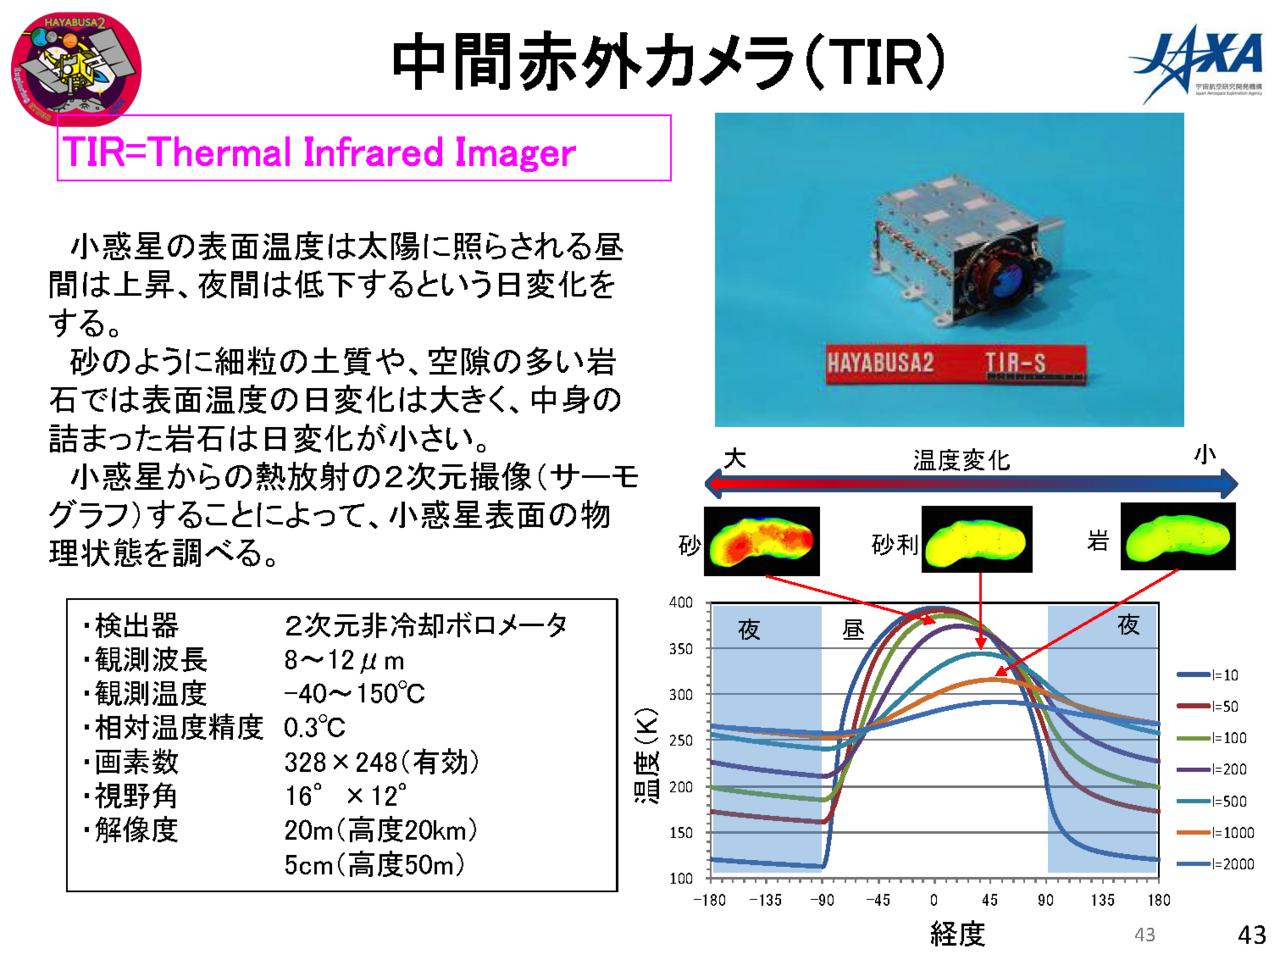 f:id:Imamura:20180802150003p:plain